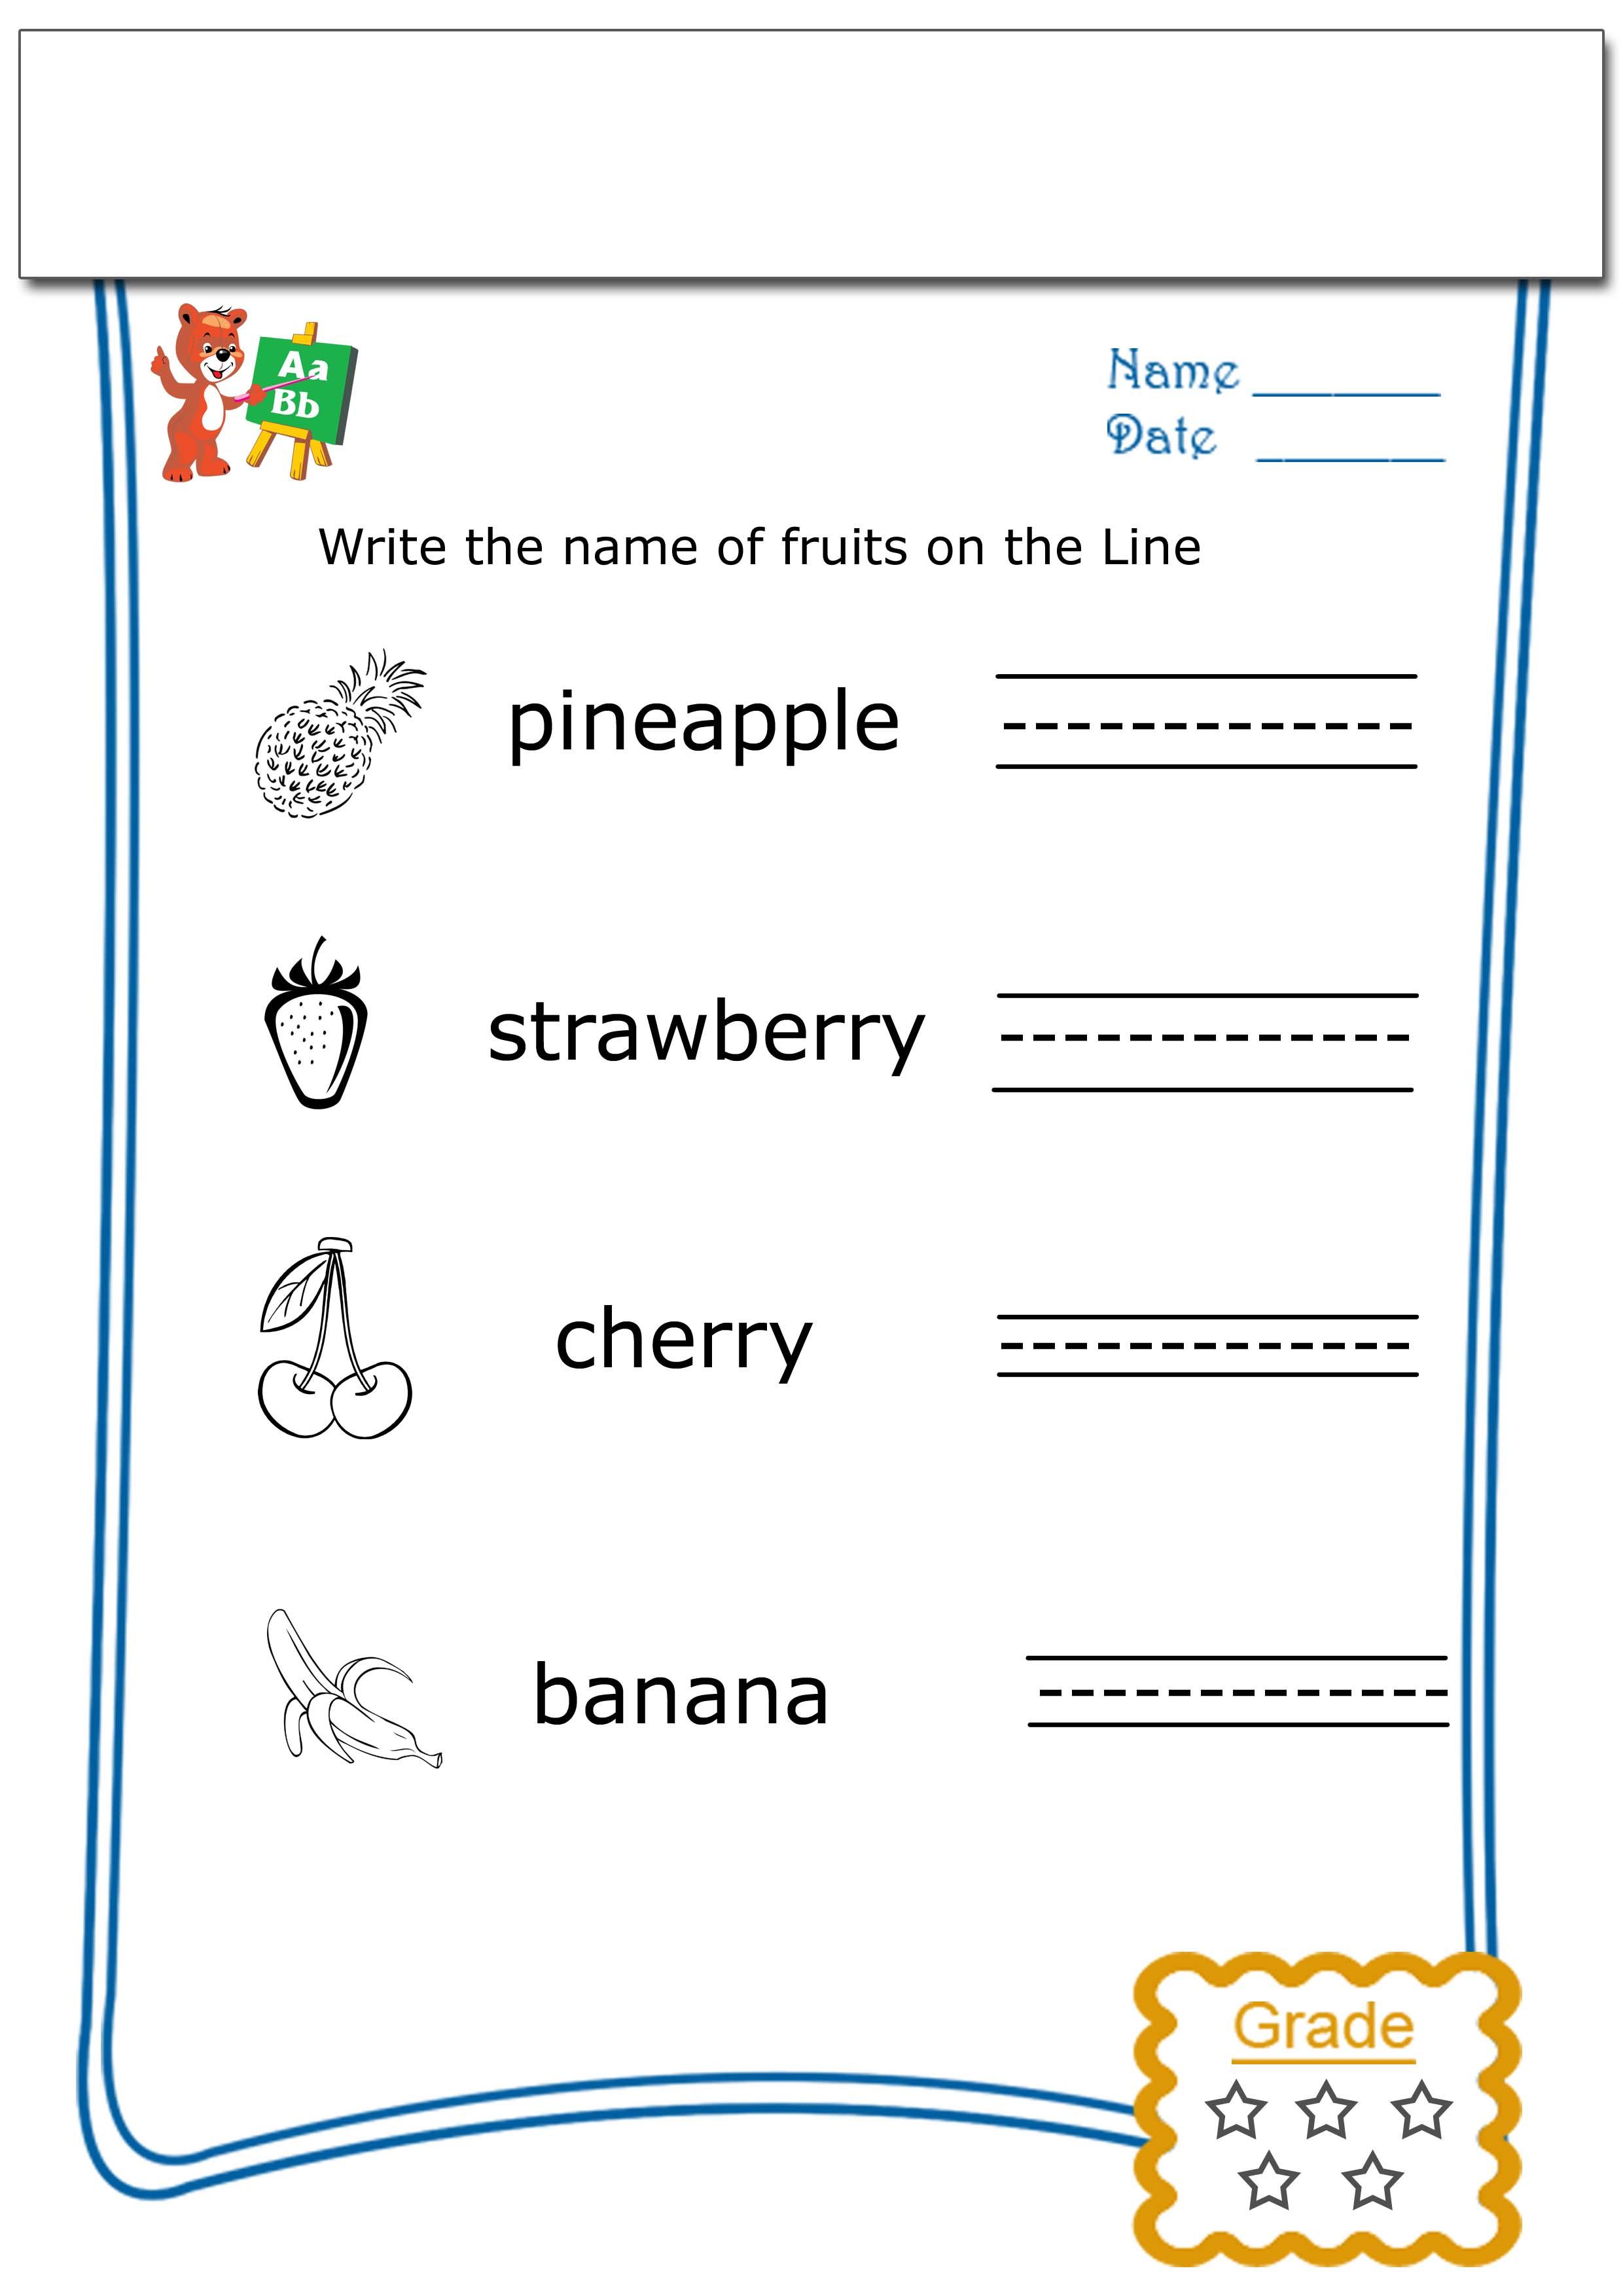 Kindergarten worksheets free - Write the name of each fruit - 2